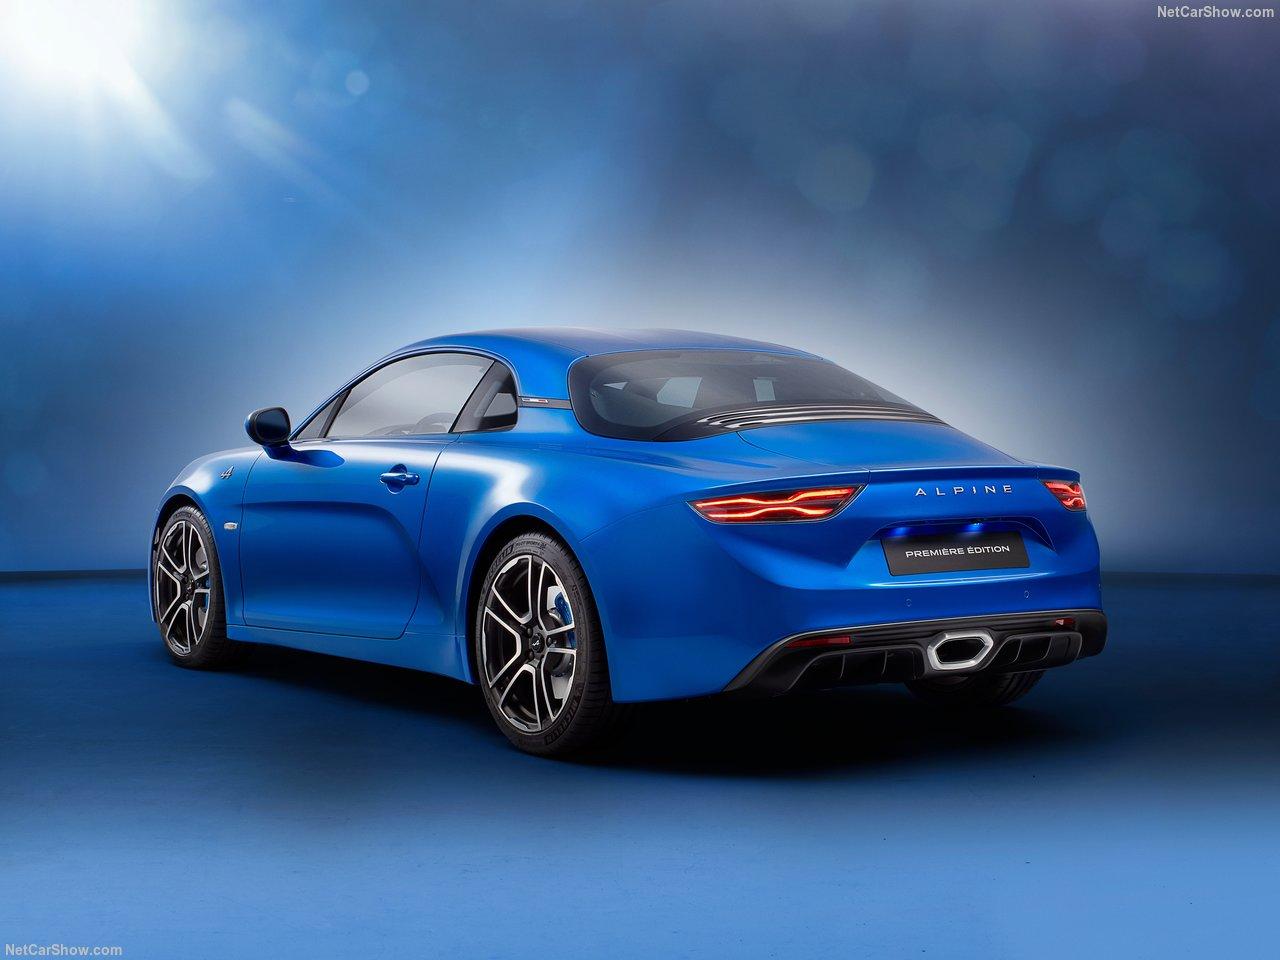 Buick Regal Gs 2018 Review >> 2018 Alpine A110 Price, Specs, Design, Interior, Exterior